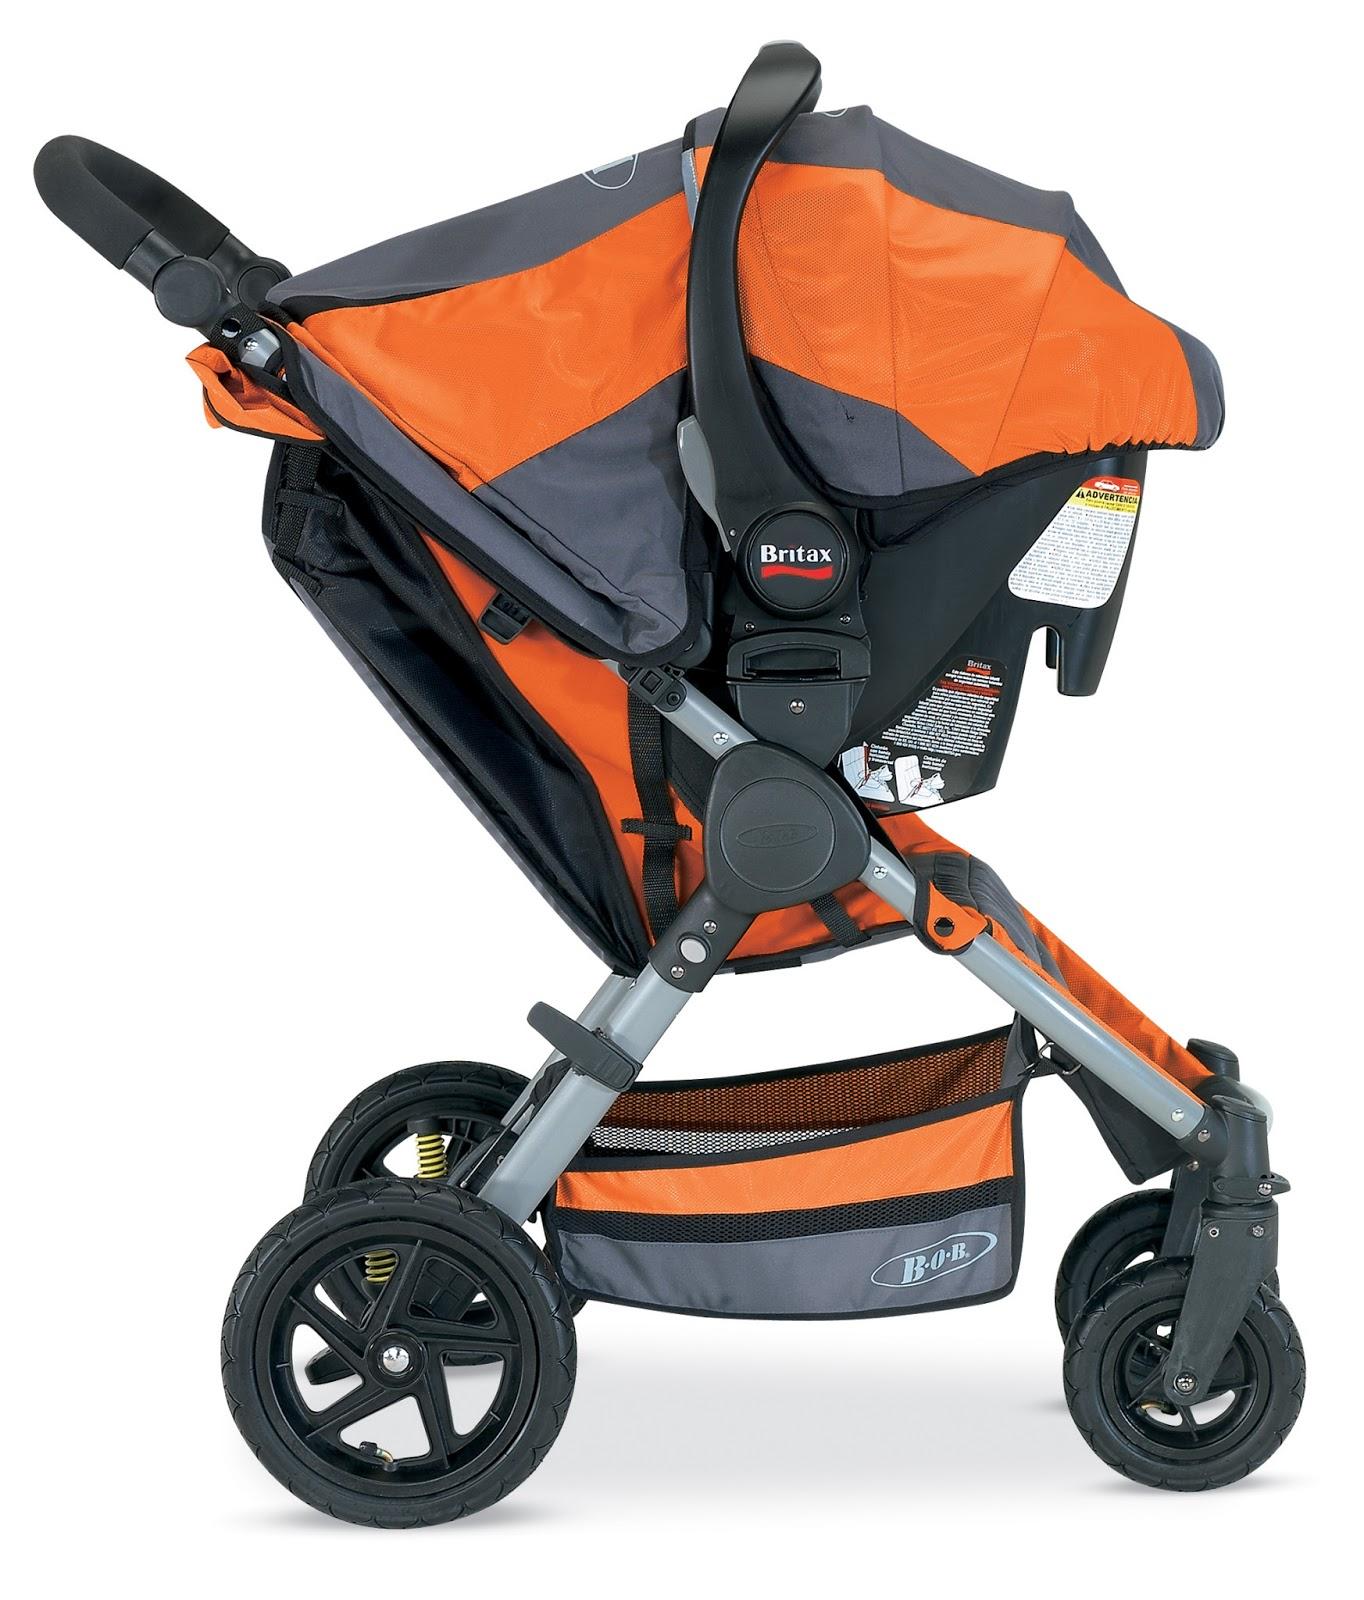 bob gearr introduces first four wheel stroller born 2 impress. Black Bedroom Furniture Sets. Home Design Ideas